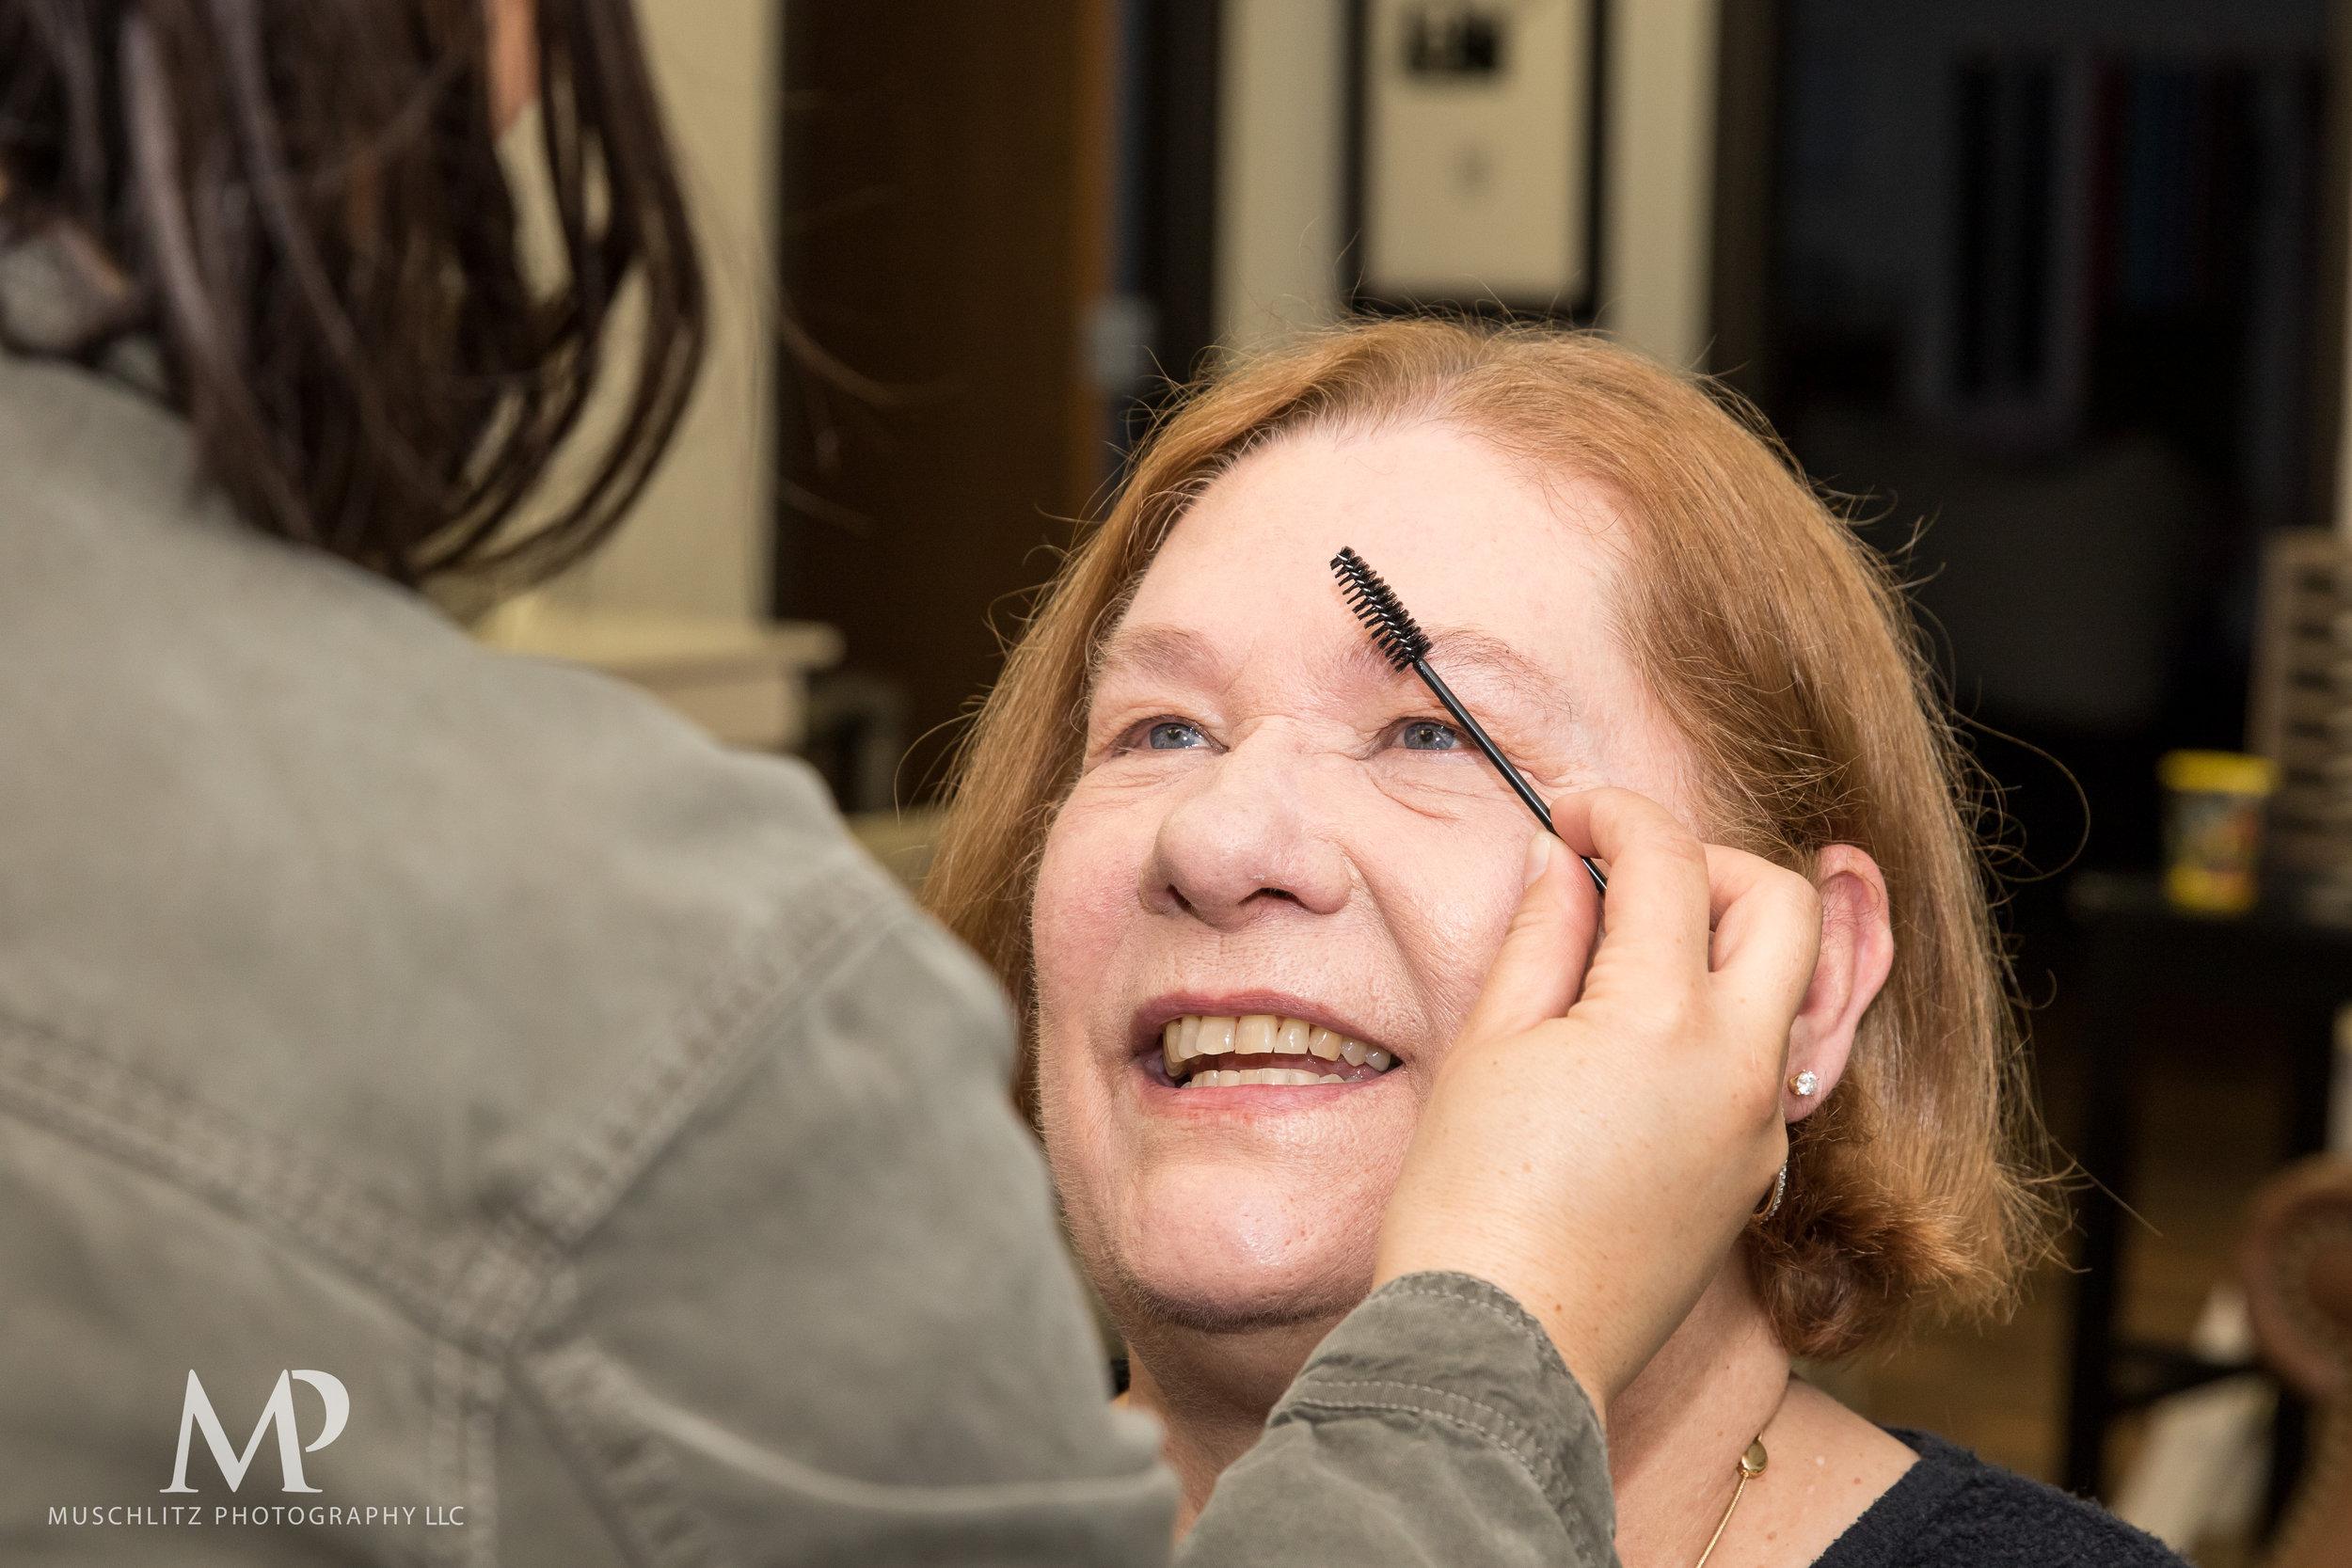 beauty-glamour-65-birthday-portrait-session-portraits-columbus-ohio-muschlitz-photography-023.JPG